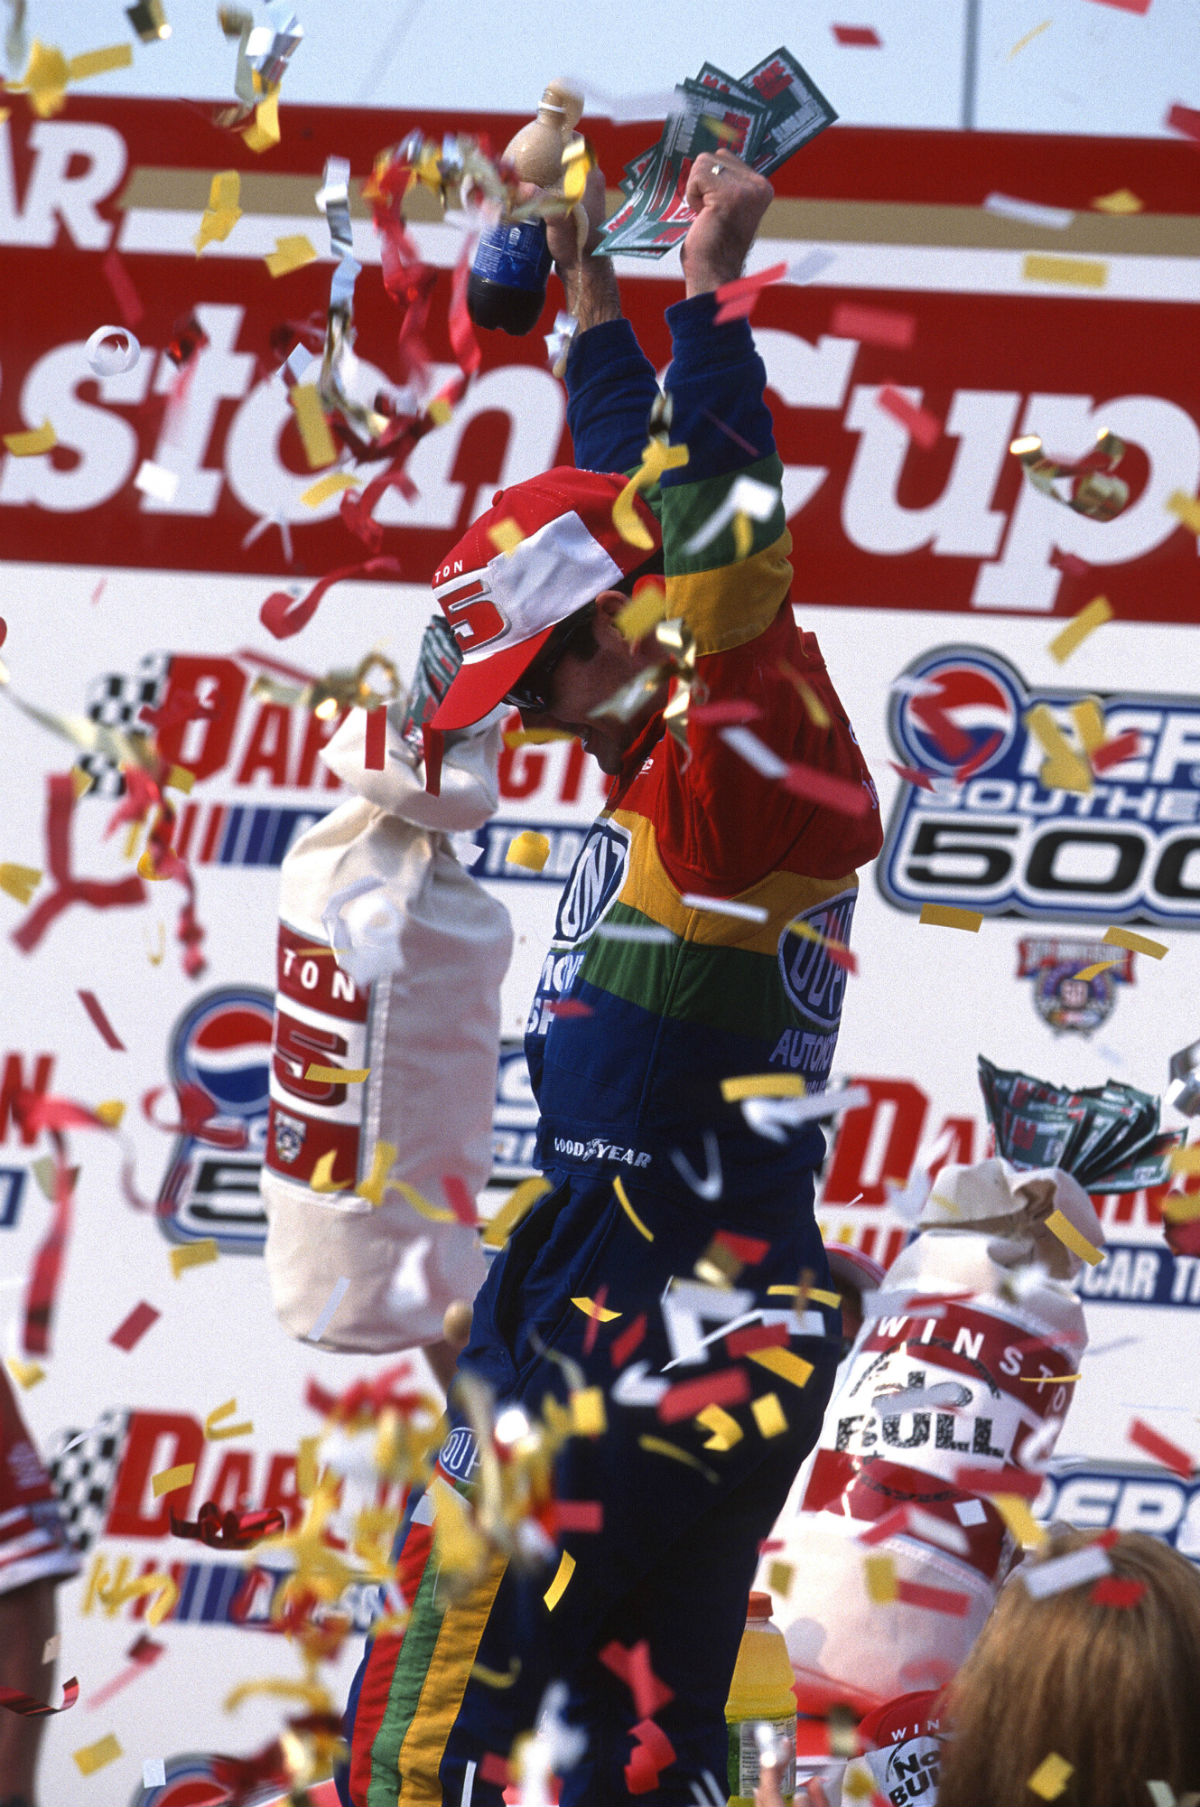 Dual Autographed Jeff Gordon / Ray Evernham 1998 #24 Darlington Race Win 1:24 Scale Die Cast